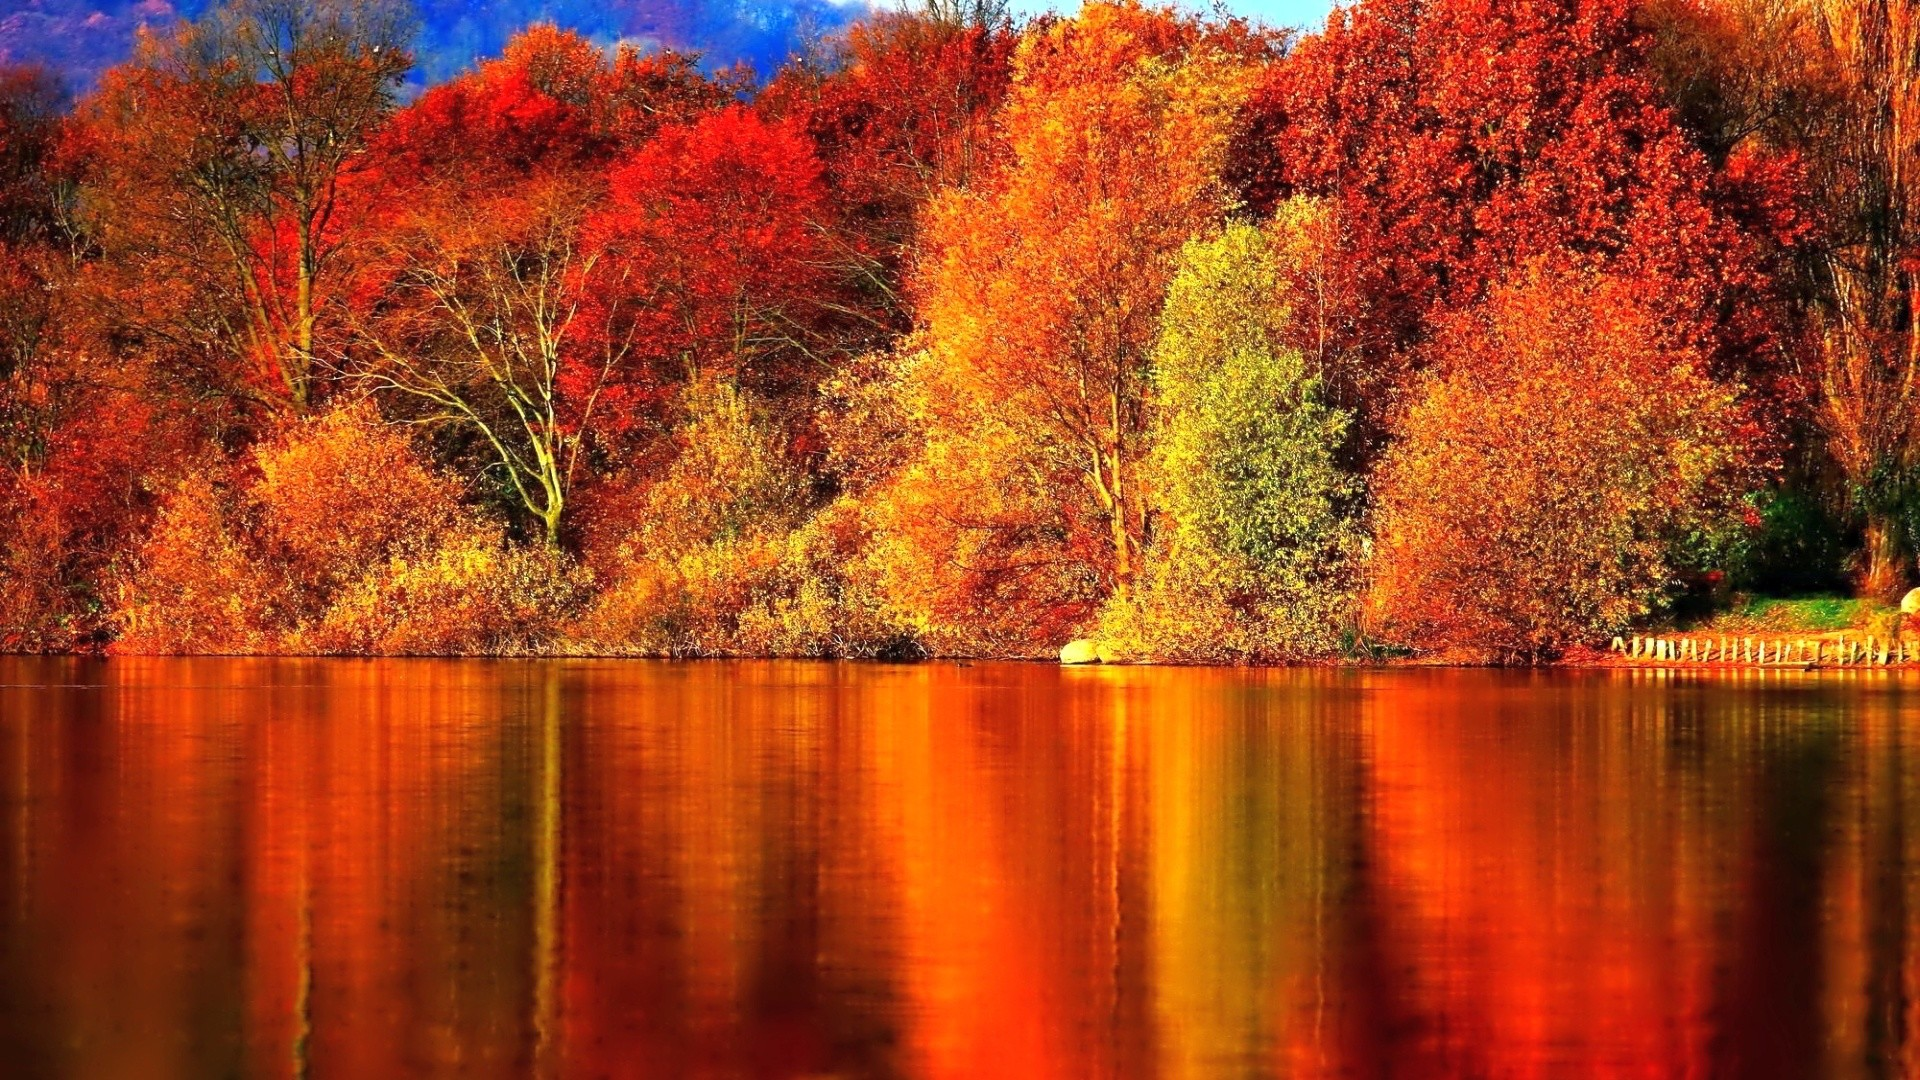 Zendha Autumn Desktop Wallpaper 1920x1080